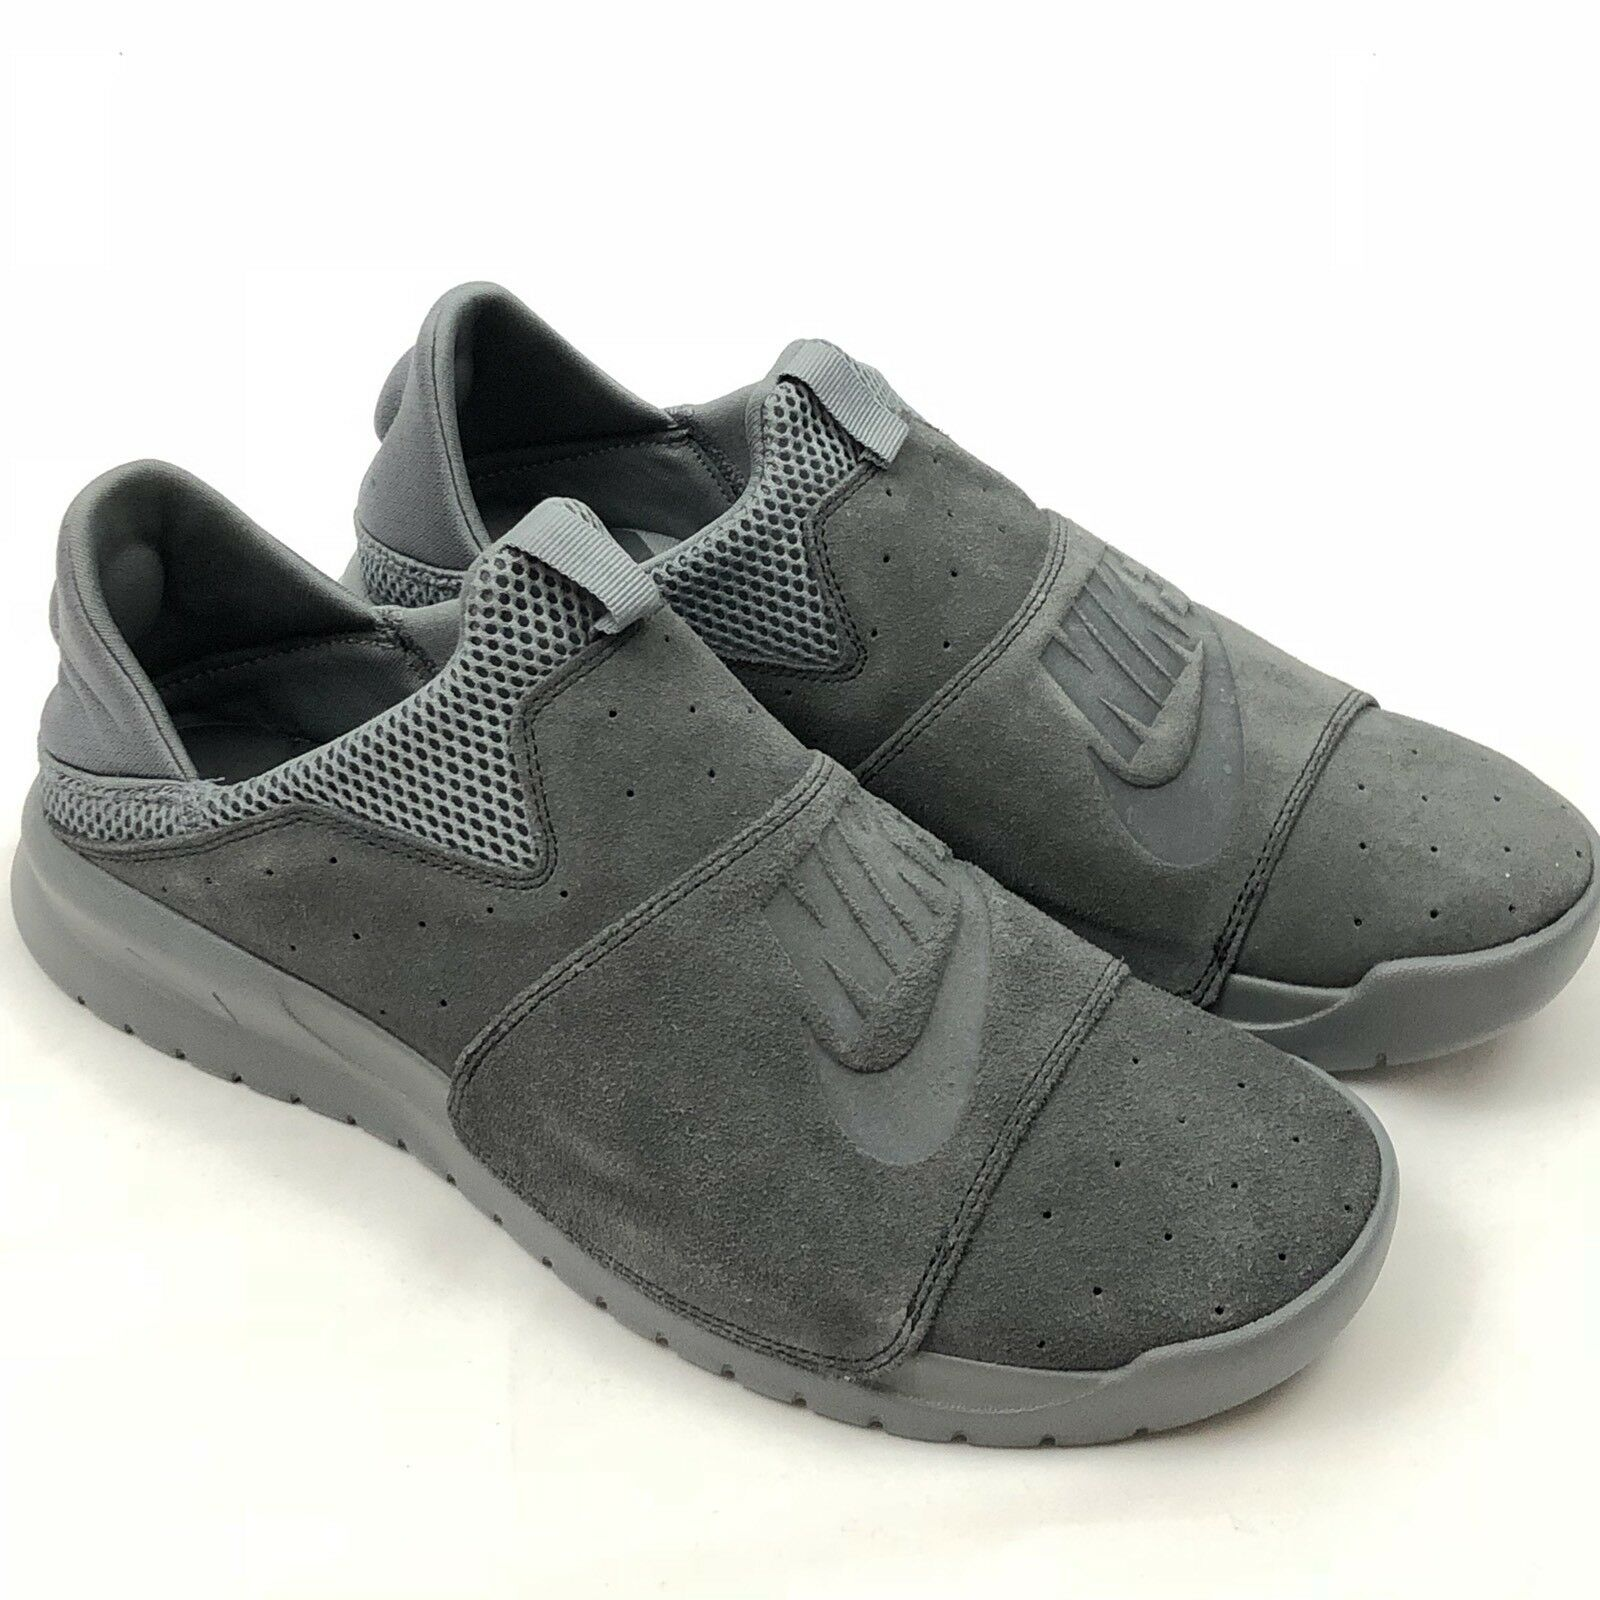 Nike antracite benassi scivolare Uomo scarpe antracite Nike / antracite 882410-004 6f4d31